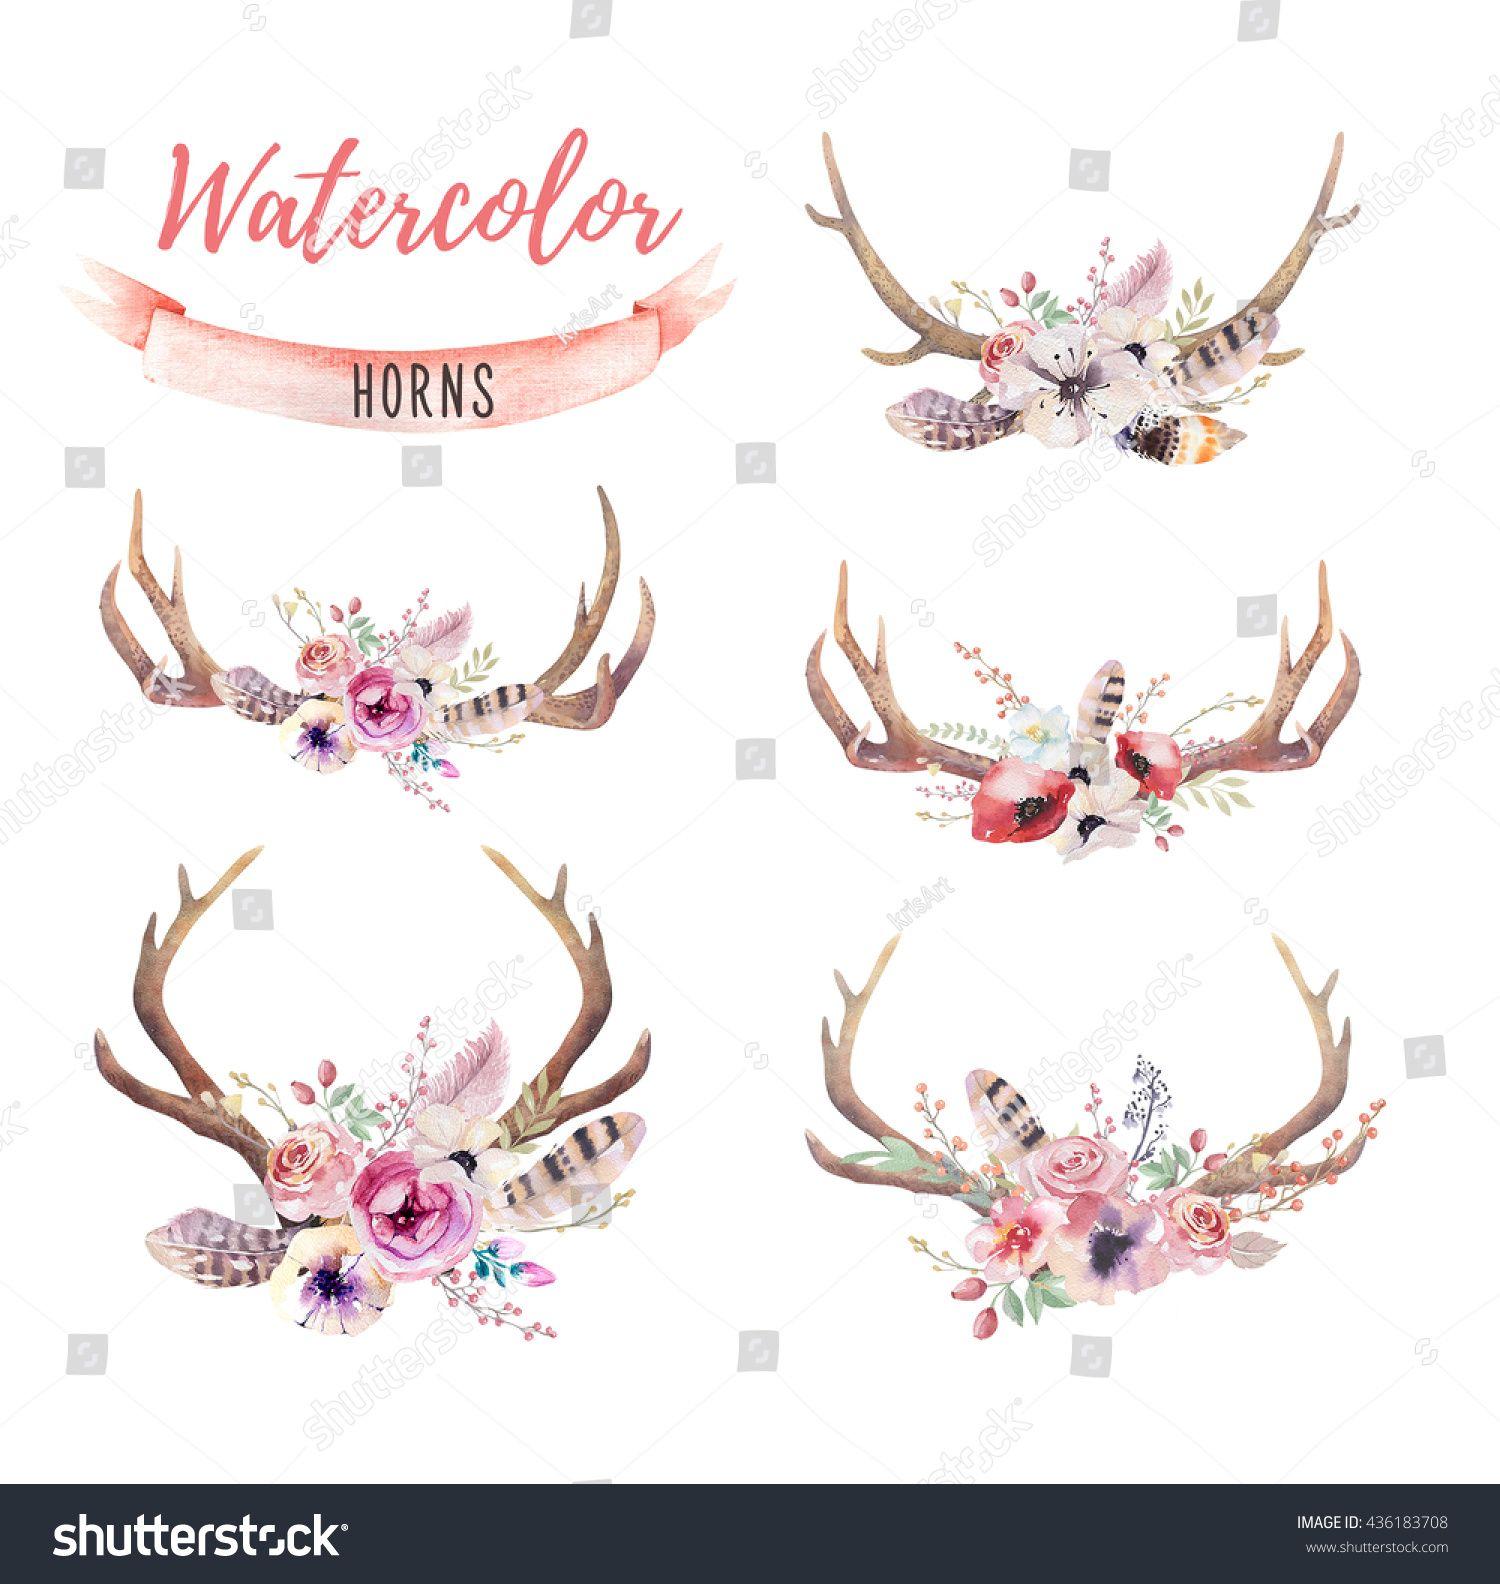 Watercolor bohemian deer horns. Antler clipart hipster